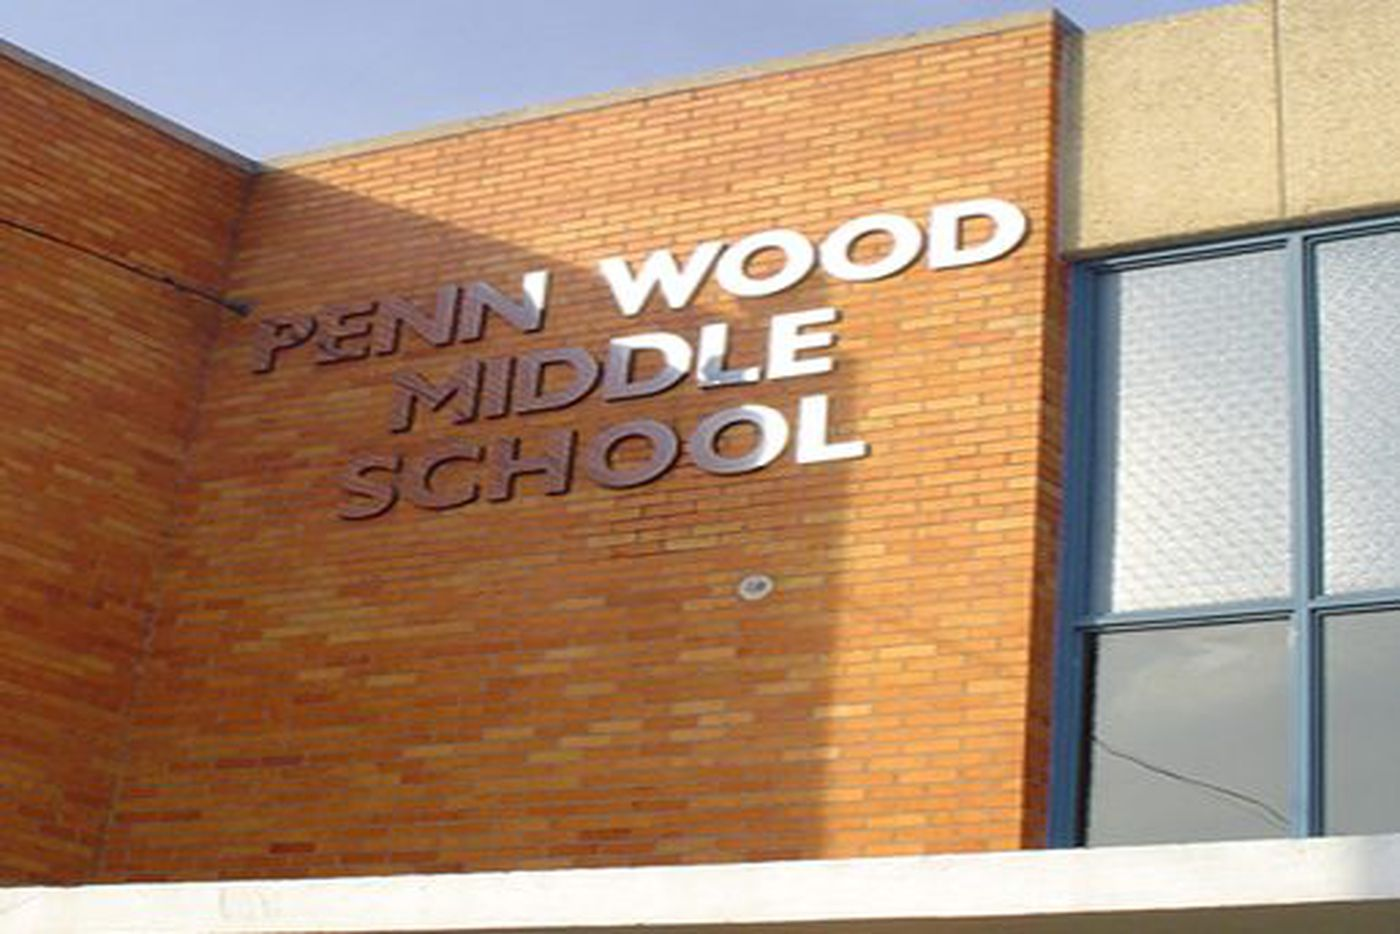 Nearby homicide investigation closes Delco middle school